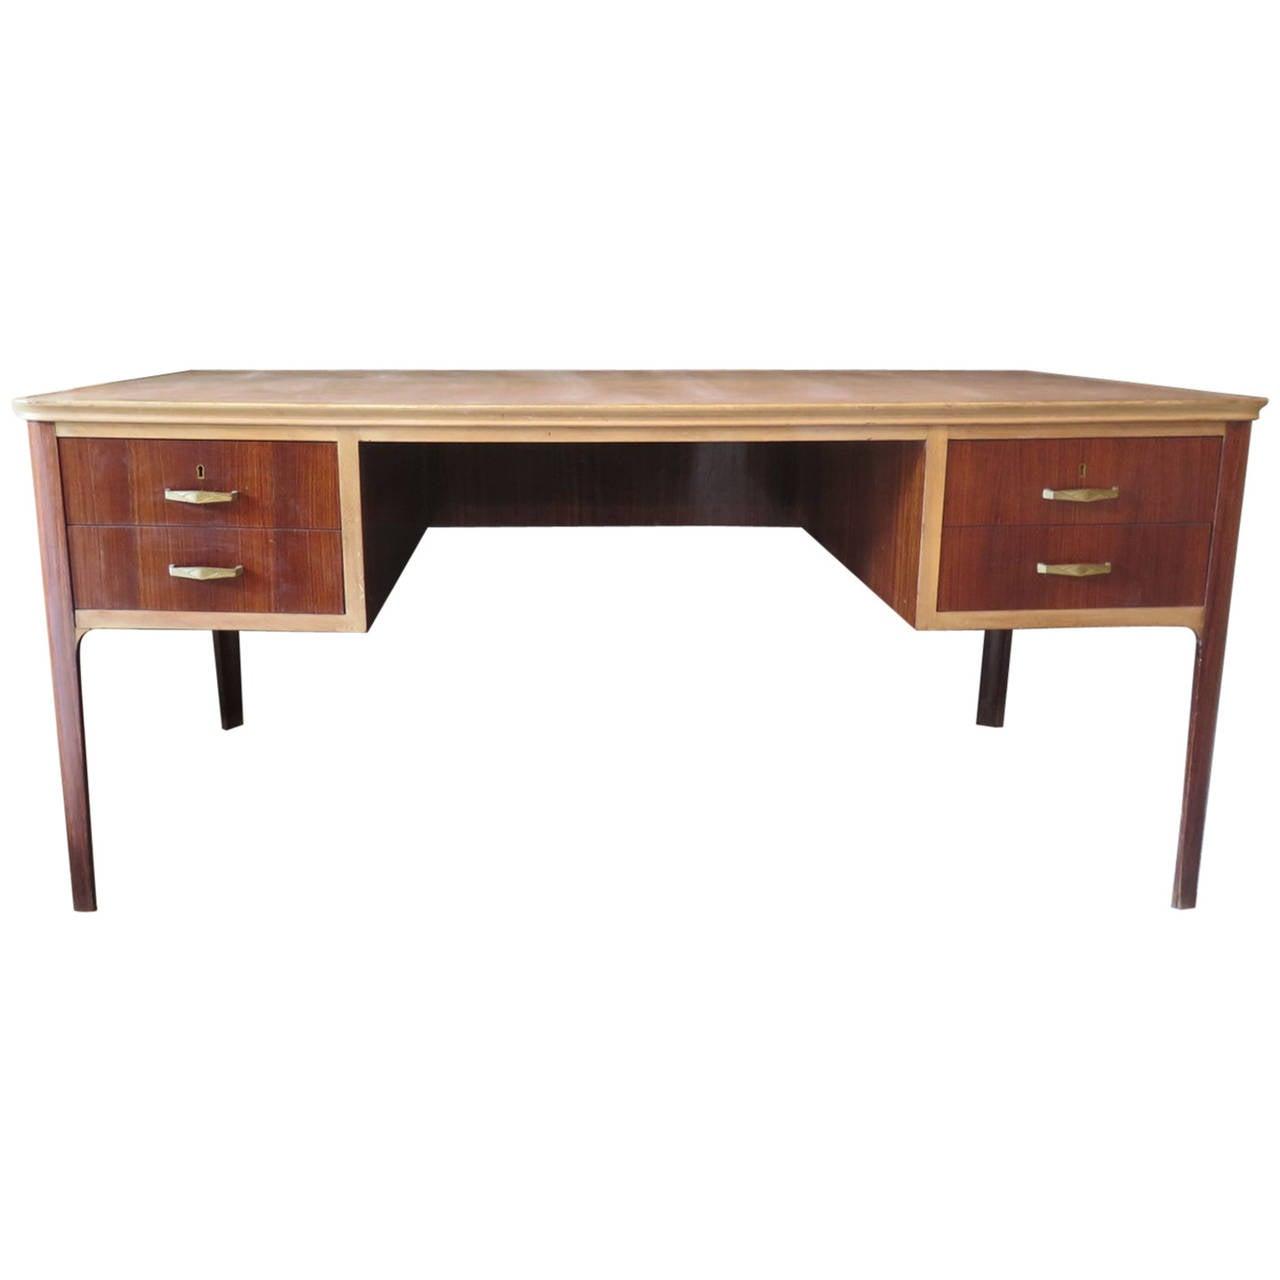 1950s Walnut Leather Midcentury Writing Desk